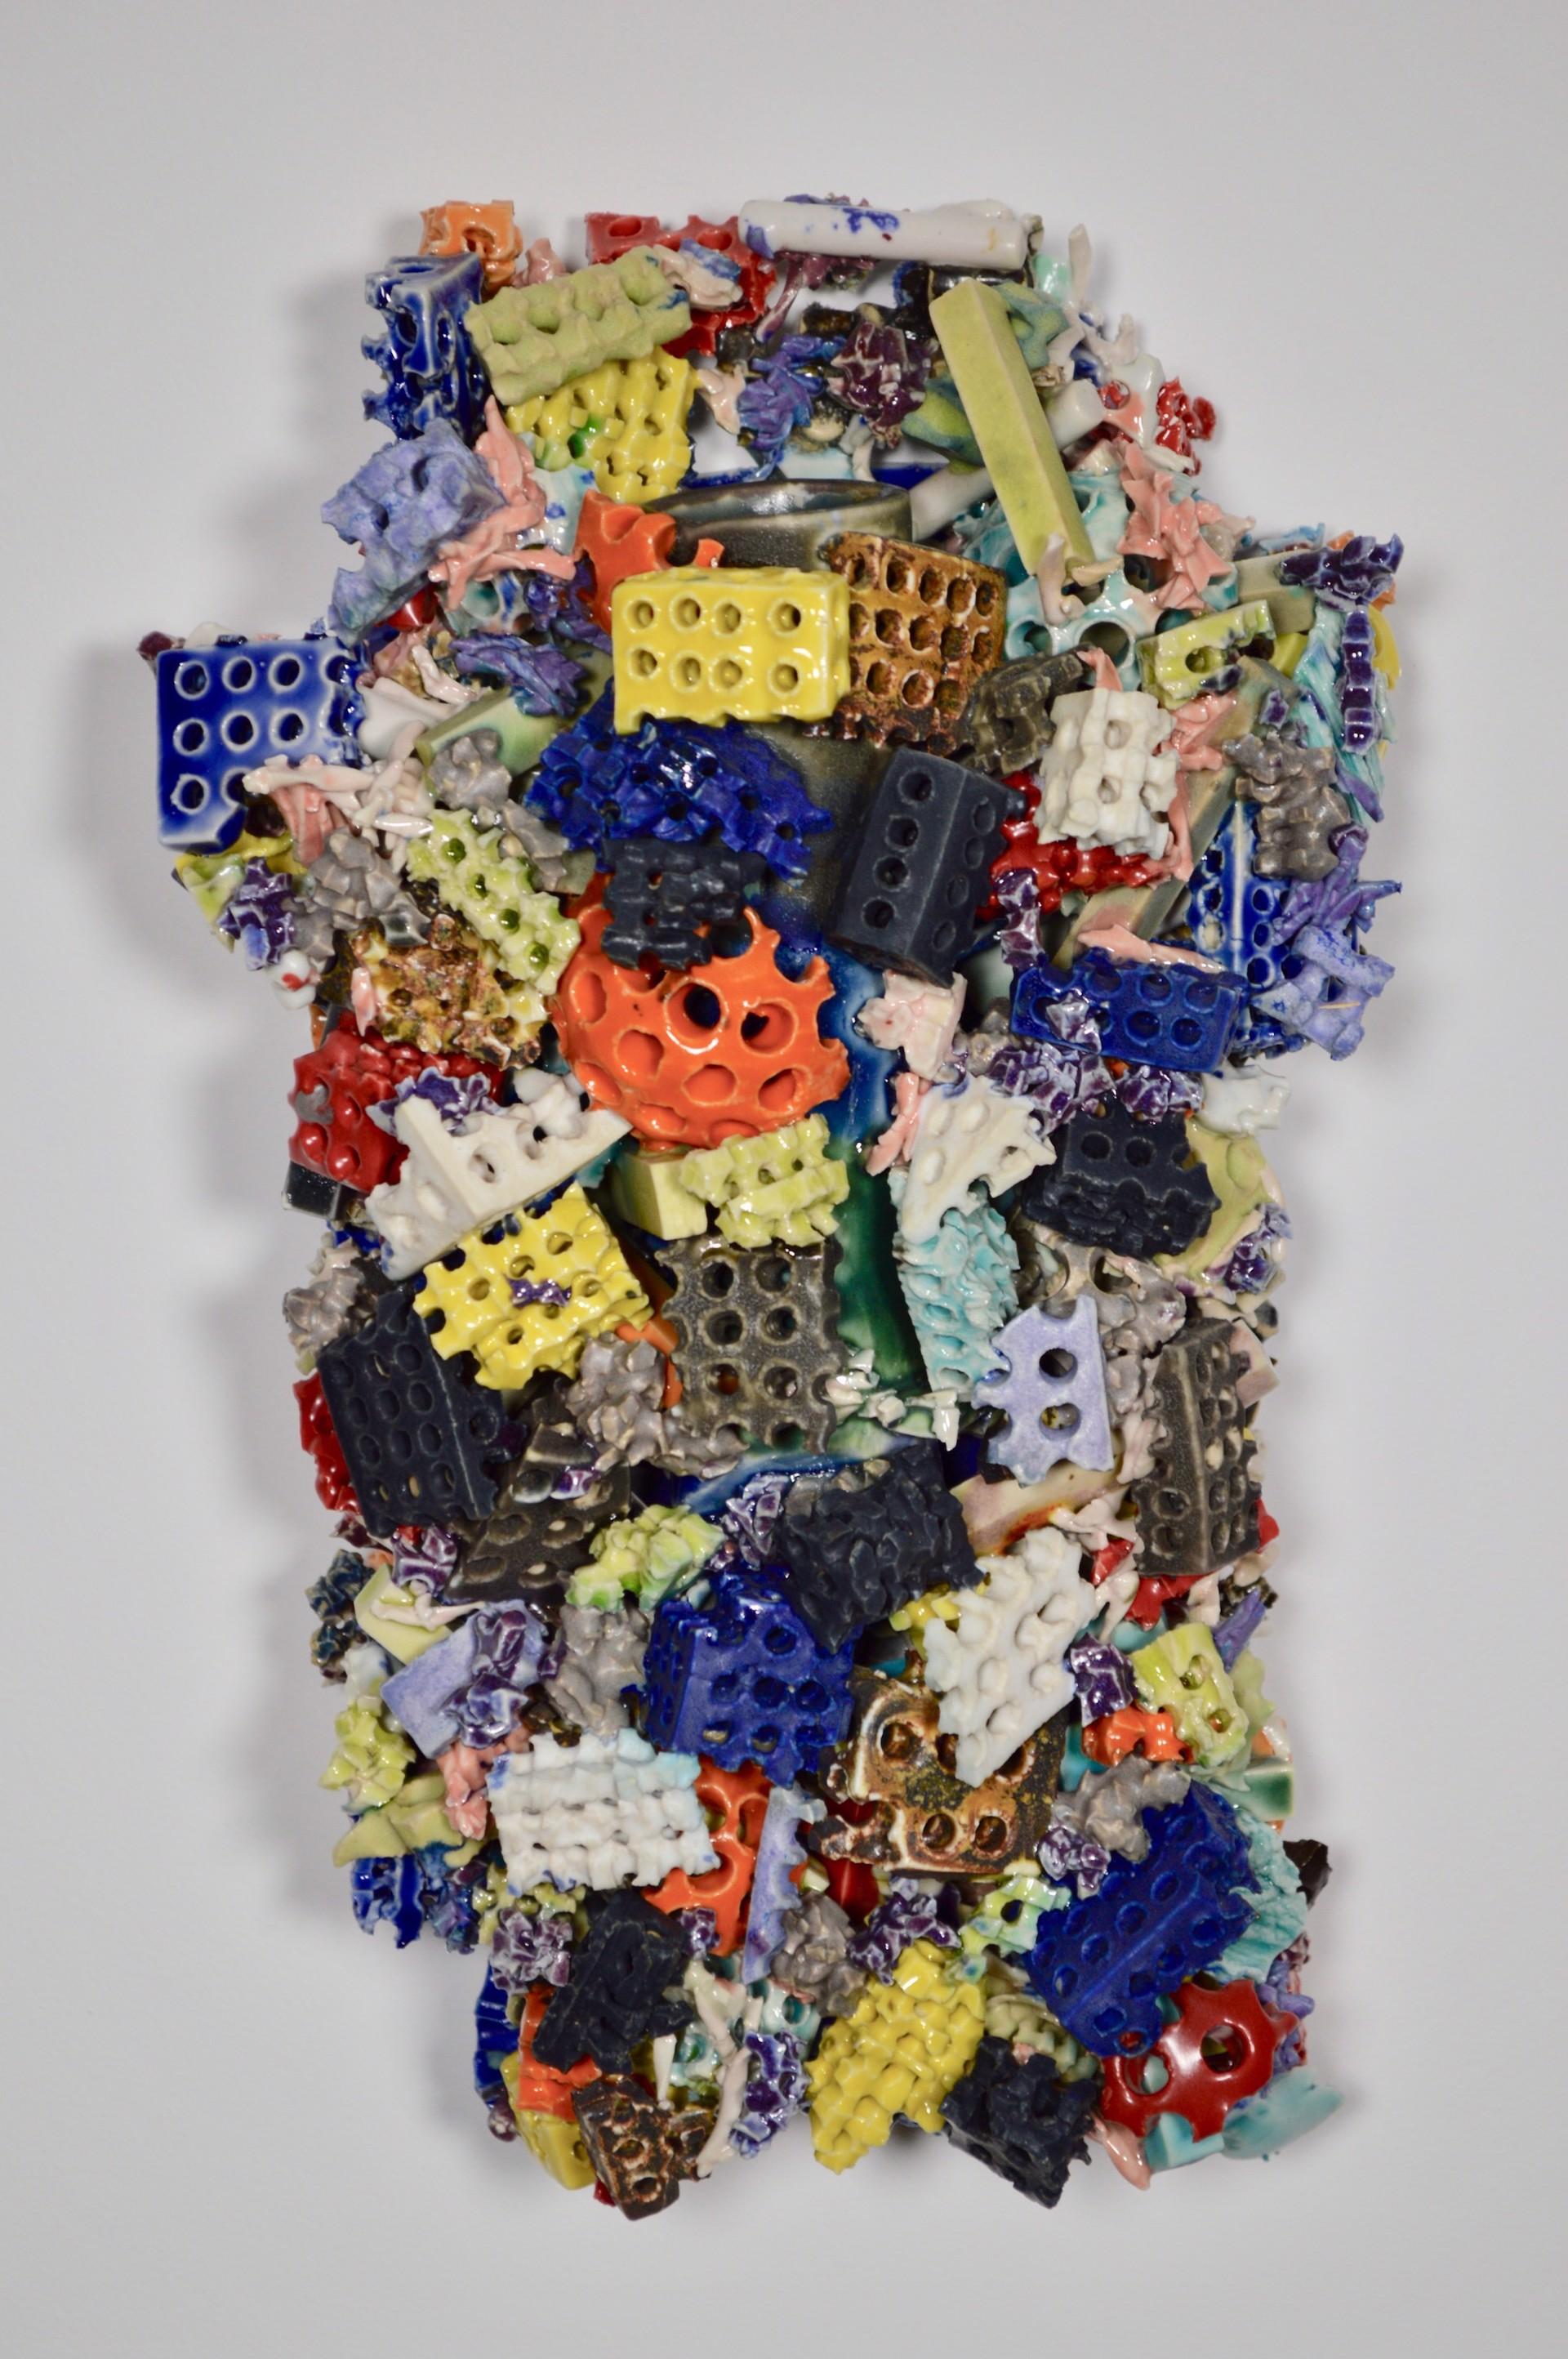 Block (vase) by Michael Fujita